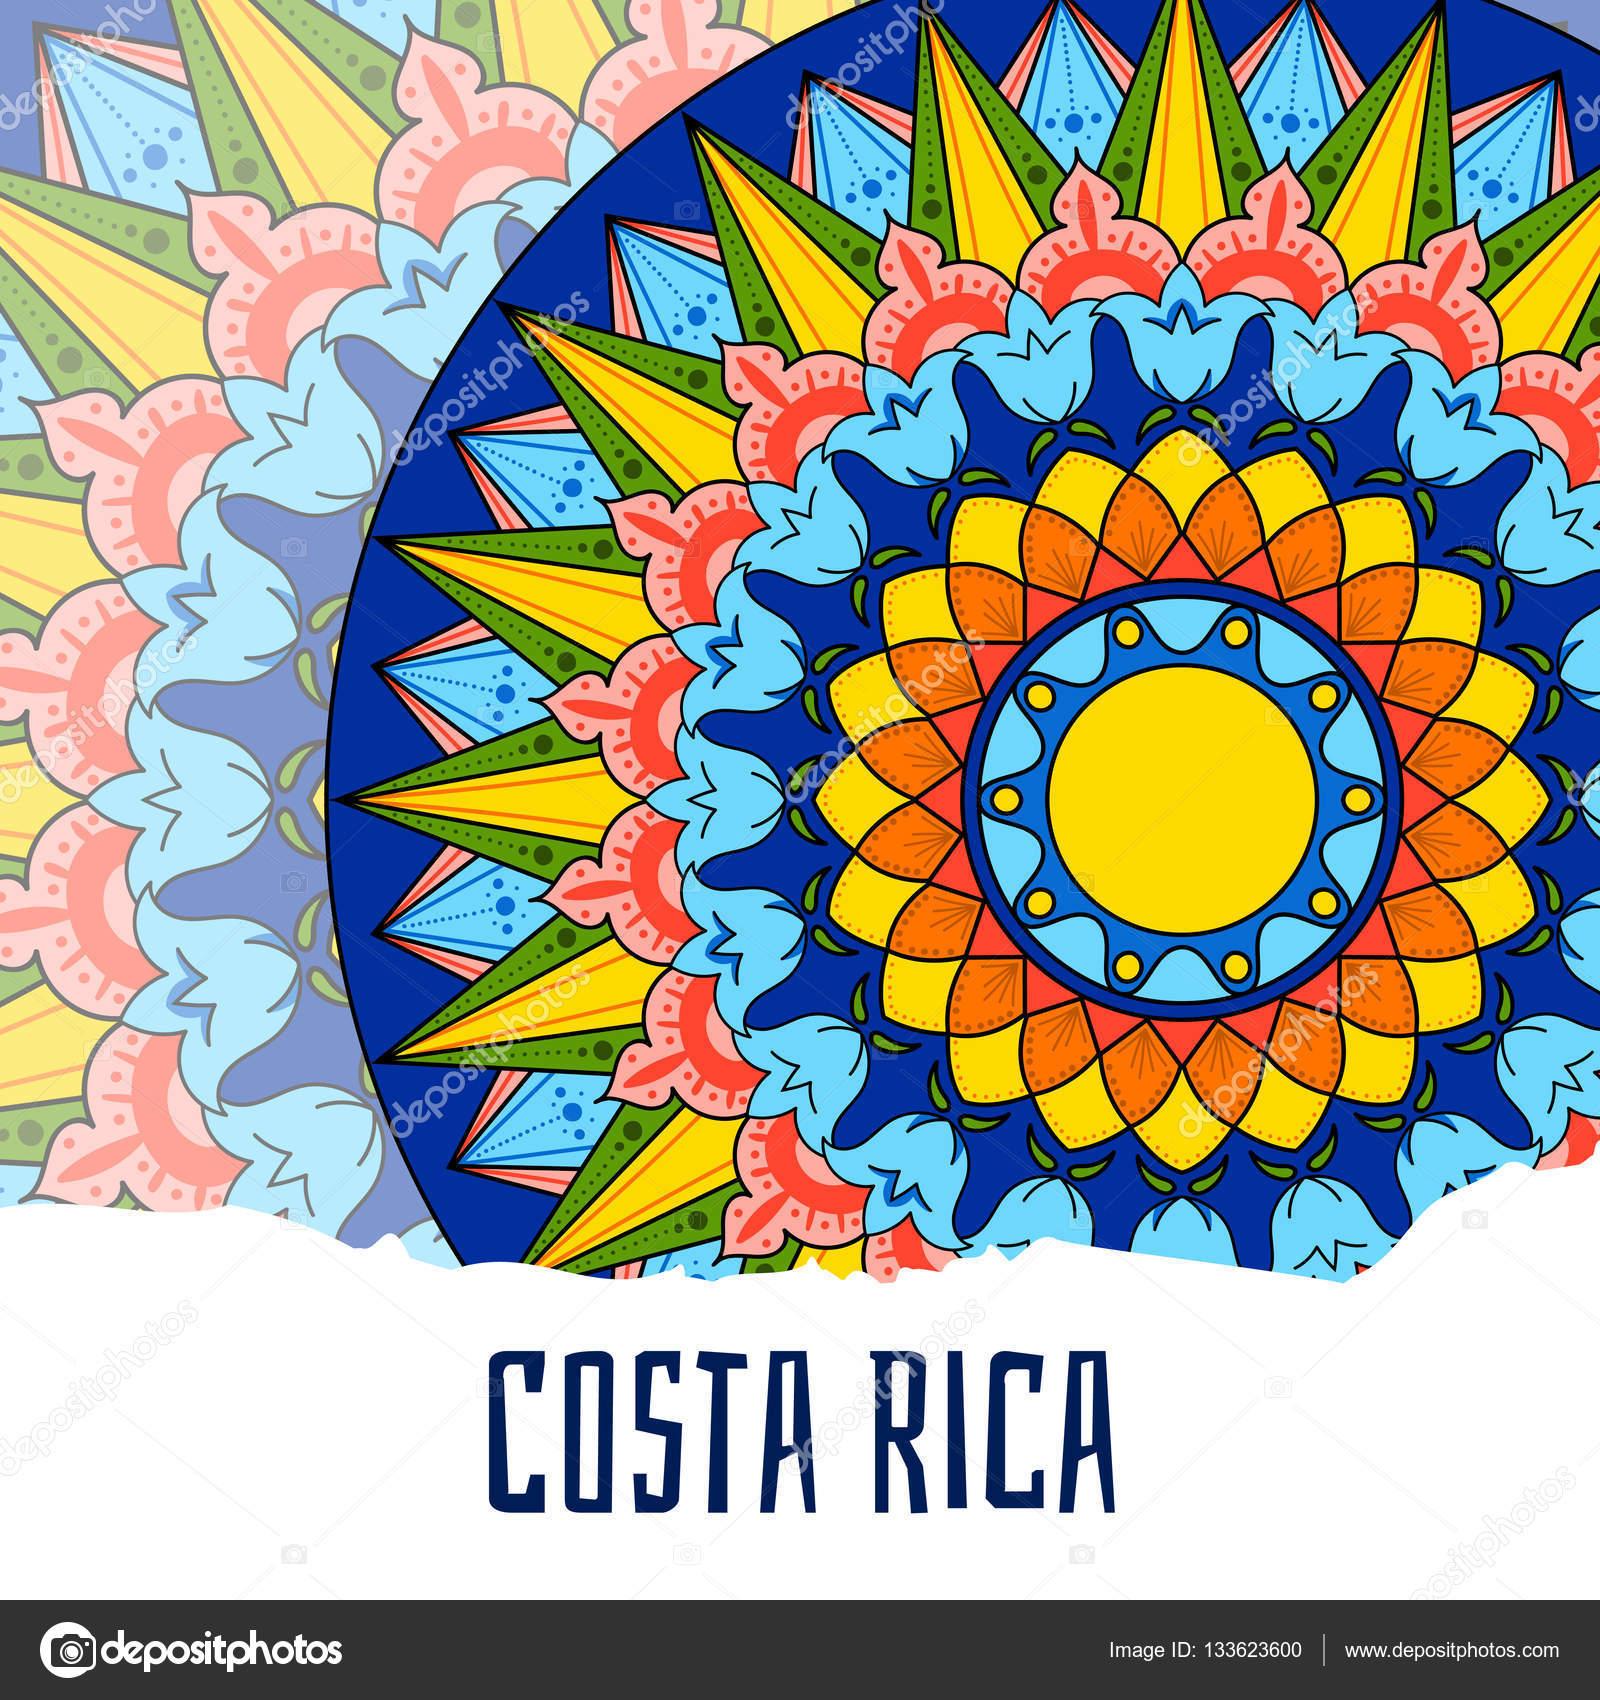 Costa rica illustration vector decorated coffee carreta ornament costa rica illustration vector decorated coffee carreta ornament wheel design for tourist symbols card biocorpaavc Gallery